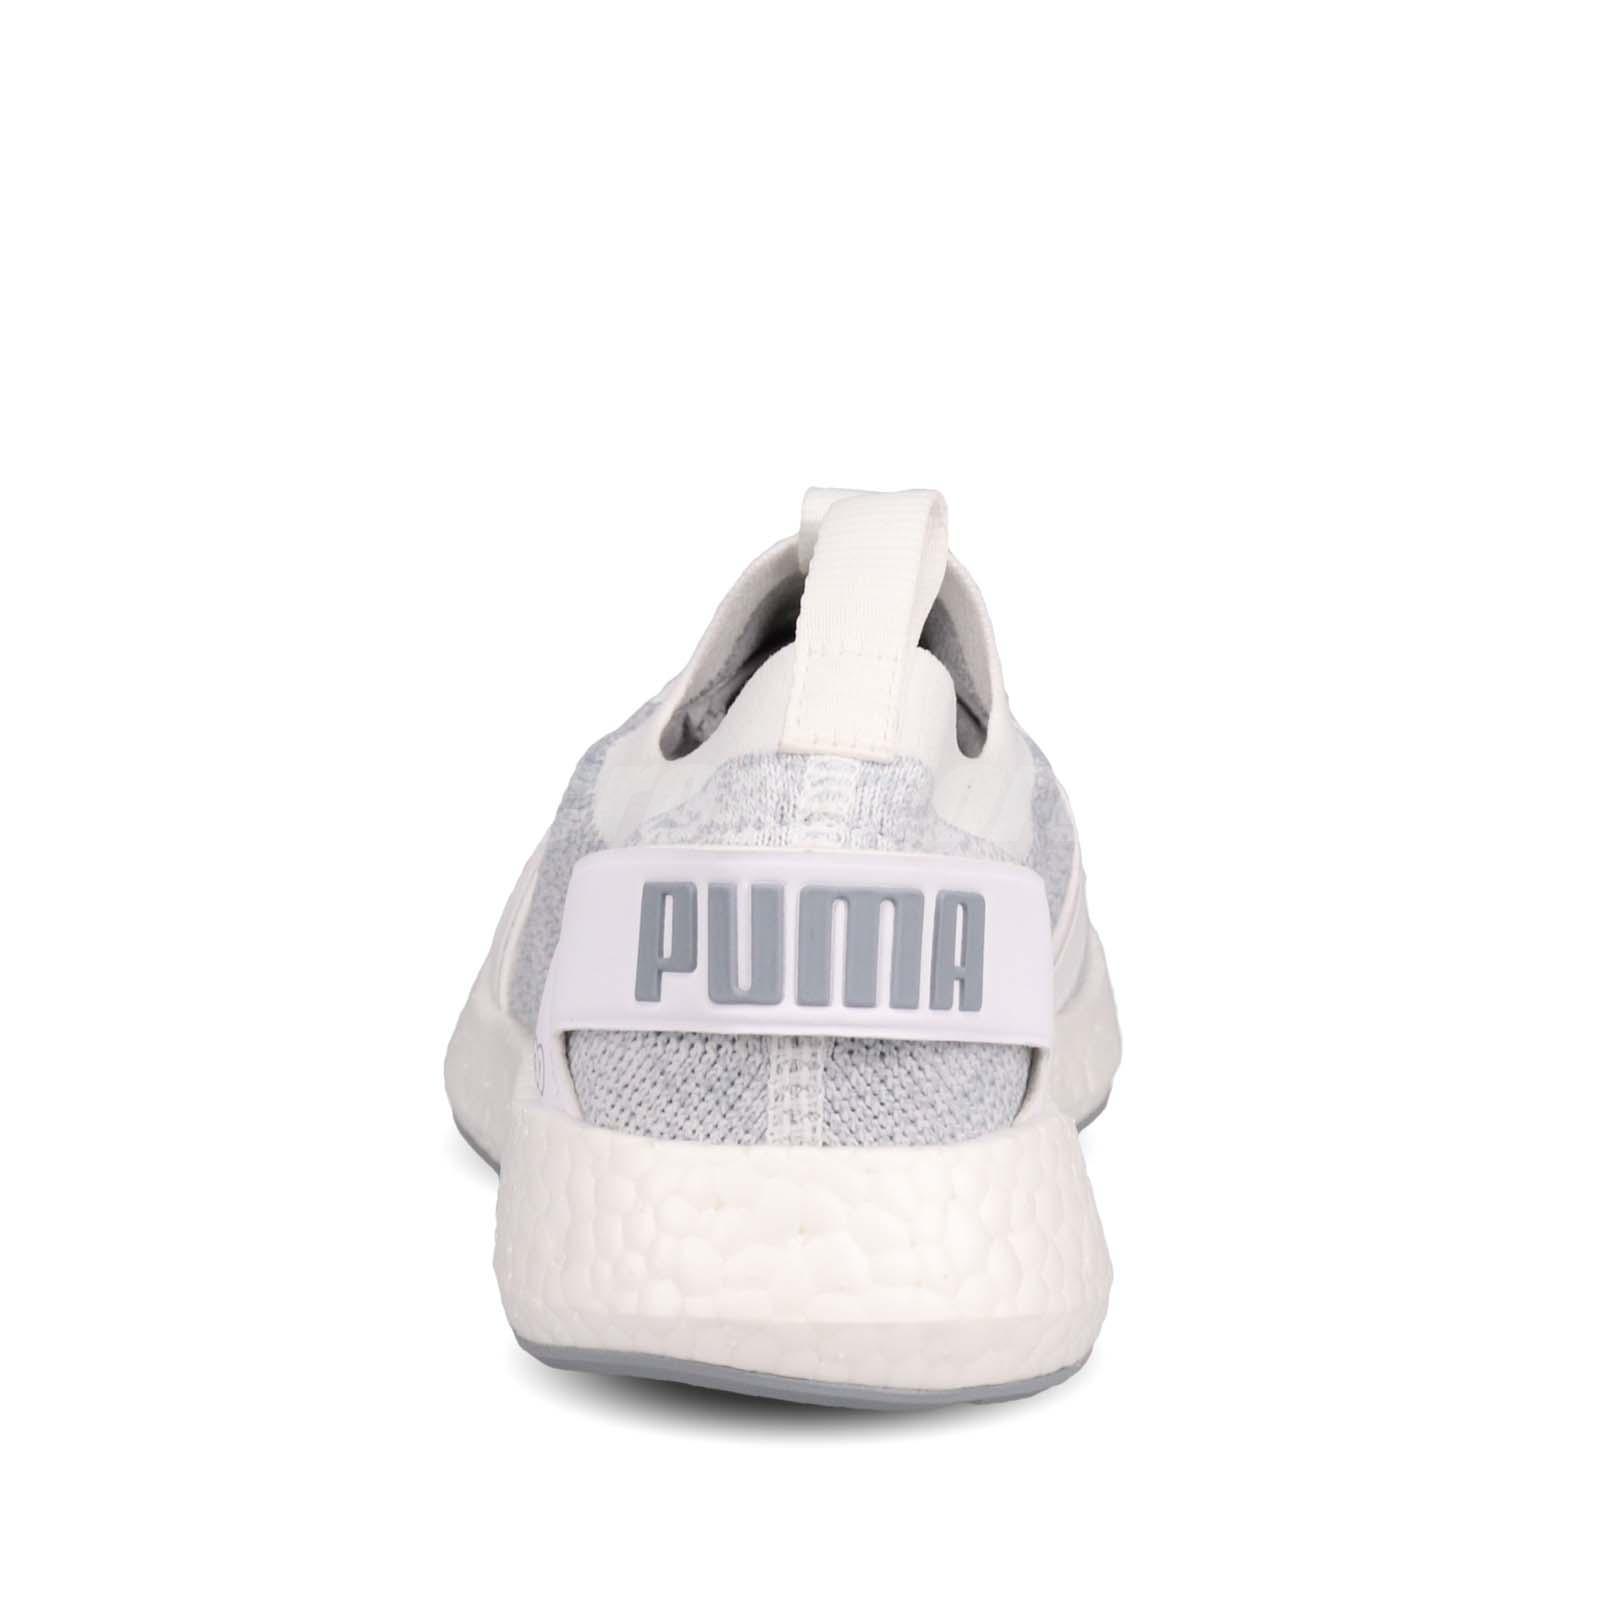 1a3b8022455 Puma NRGY Neko Engineer Knit Wns White Quarry Women Running Shoes ...